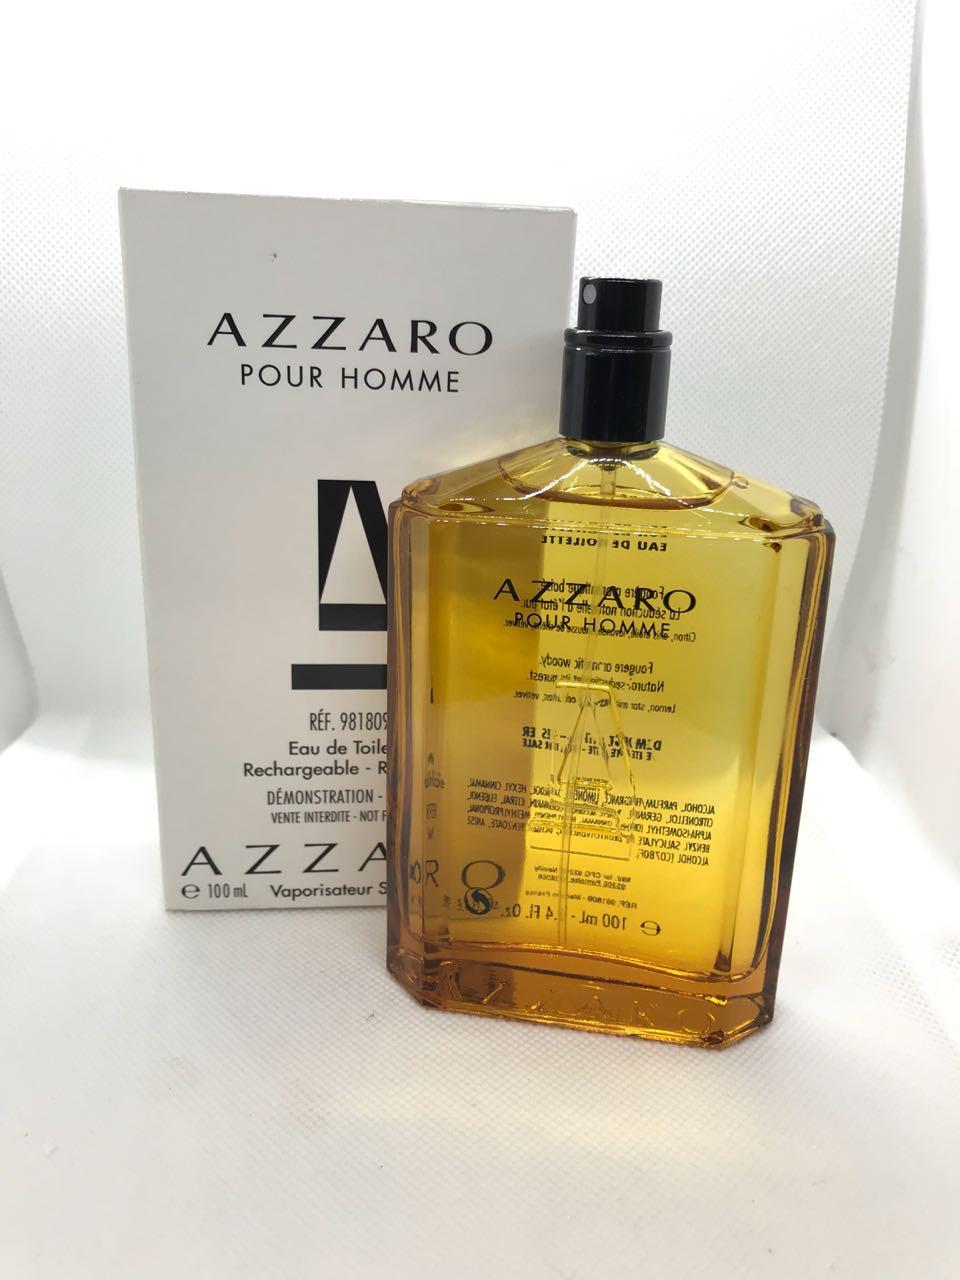 Pour Homme Azzaro Masculino Eau de Toilette 100ML - Tester